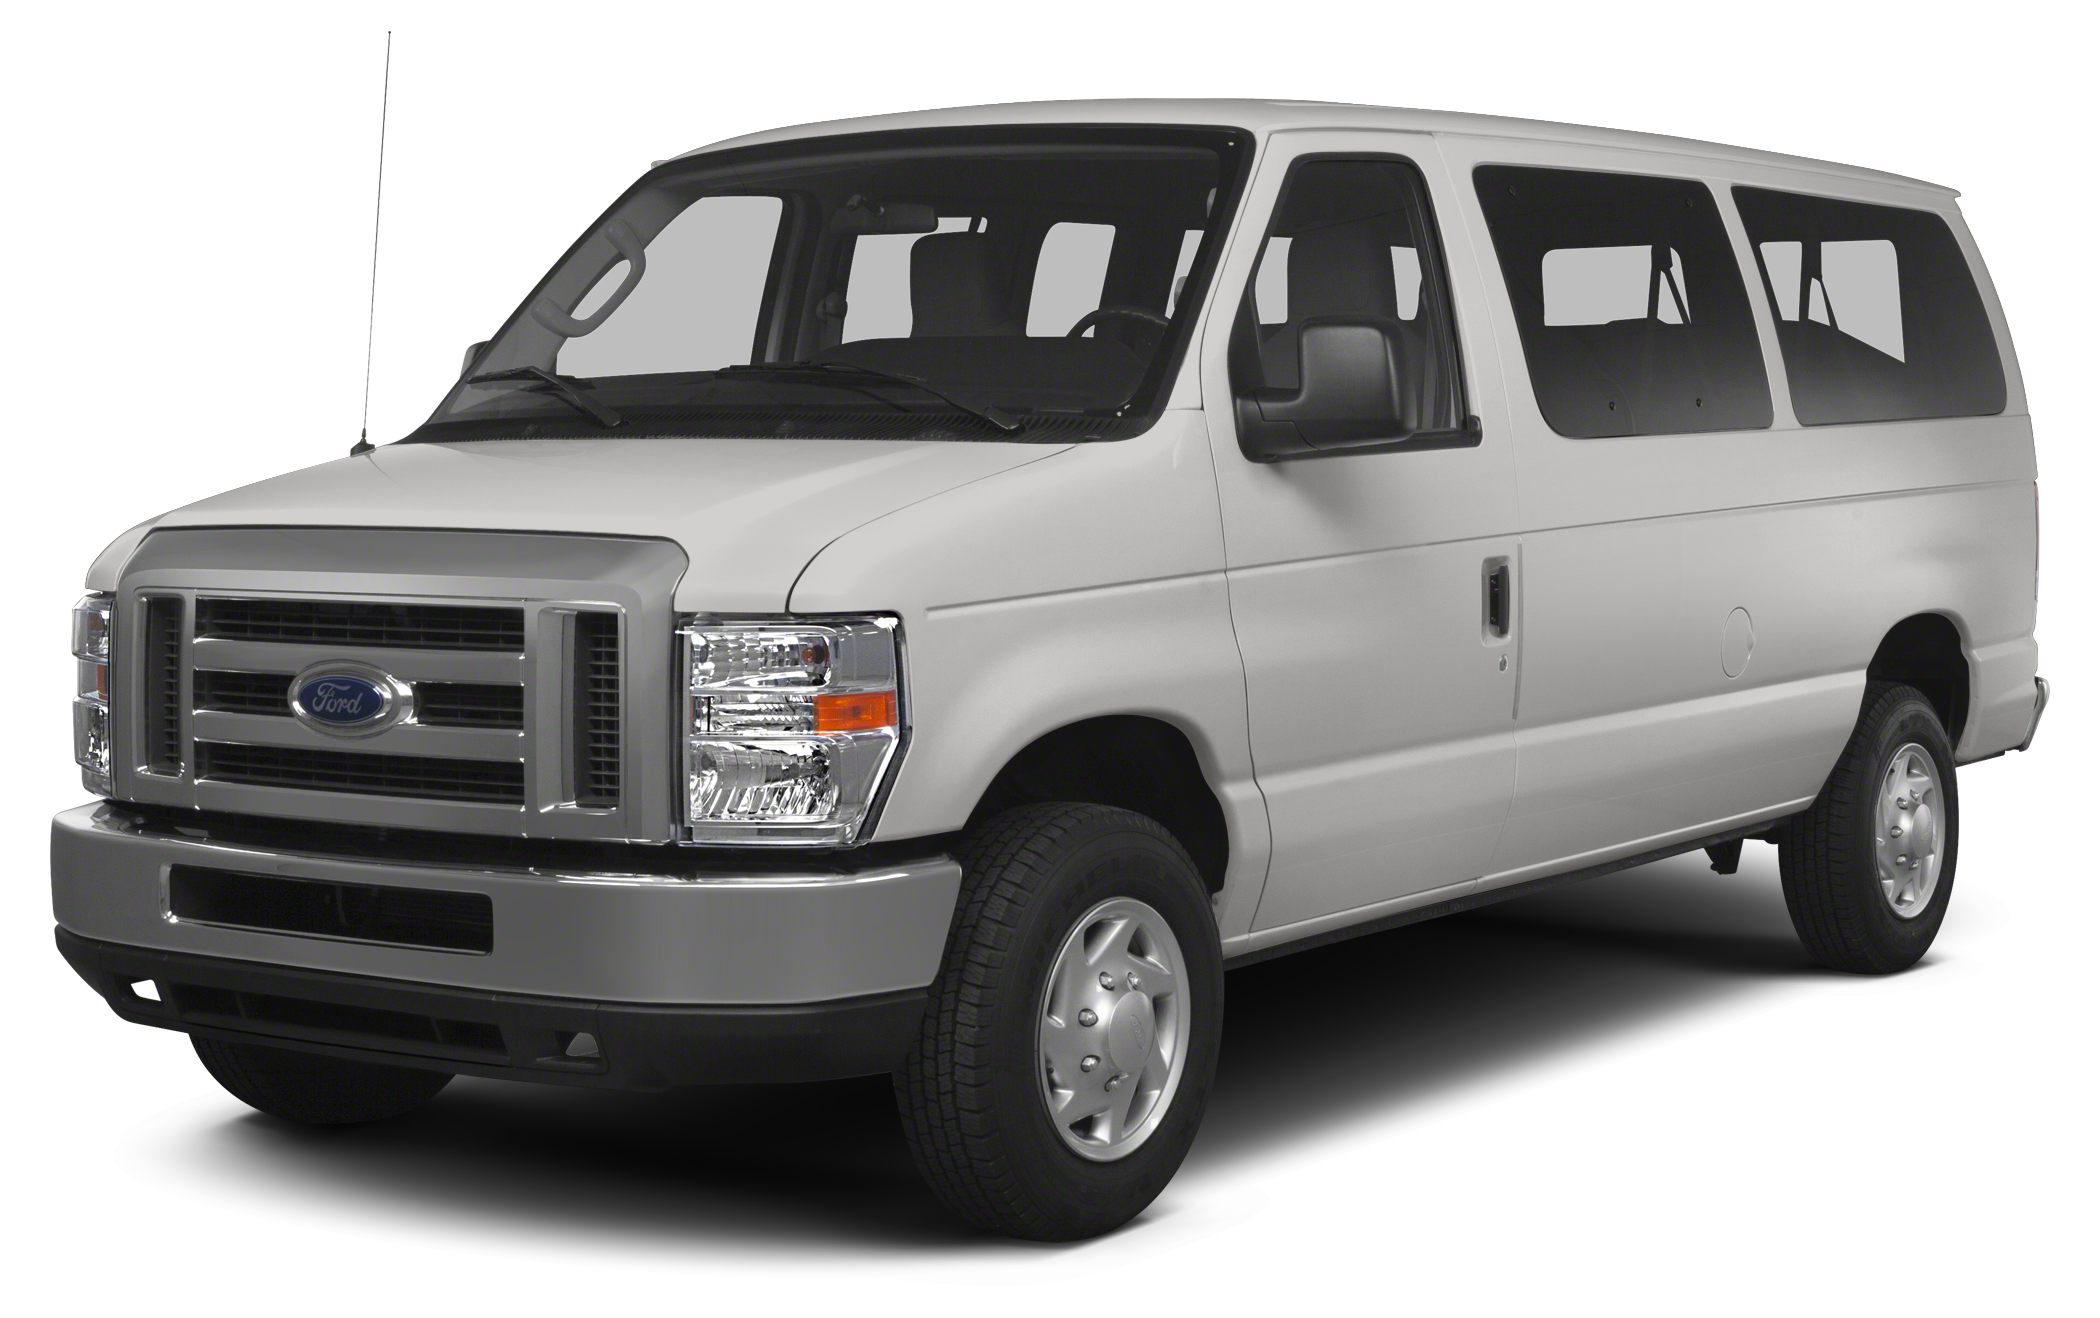 2013 Ford Econoline 350 Super Duty XLT 900 below NADA Retail Oxford White exterior and Medium Fl